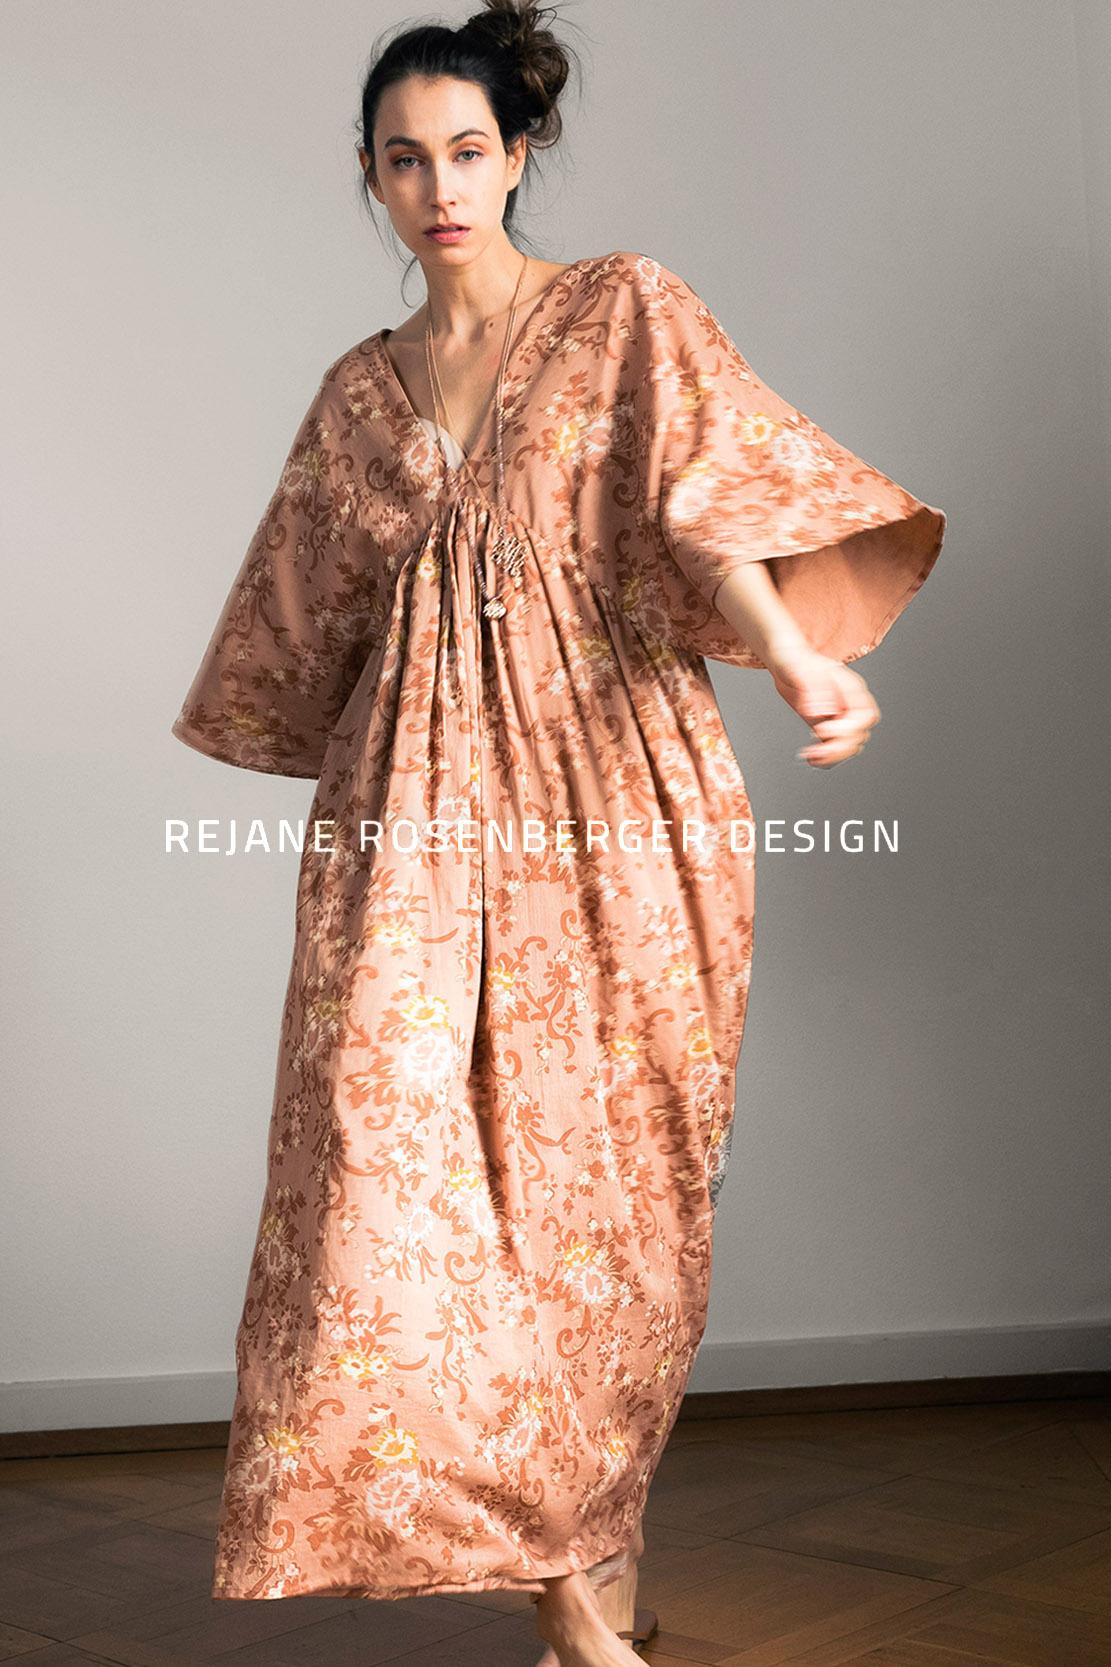 Réjane Rosenberger Design